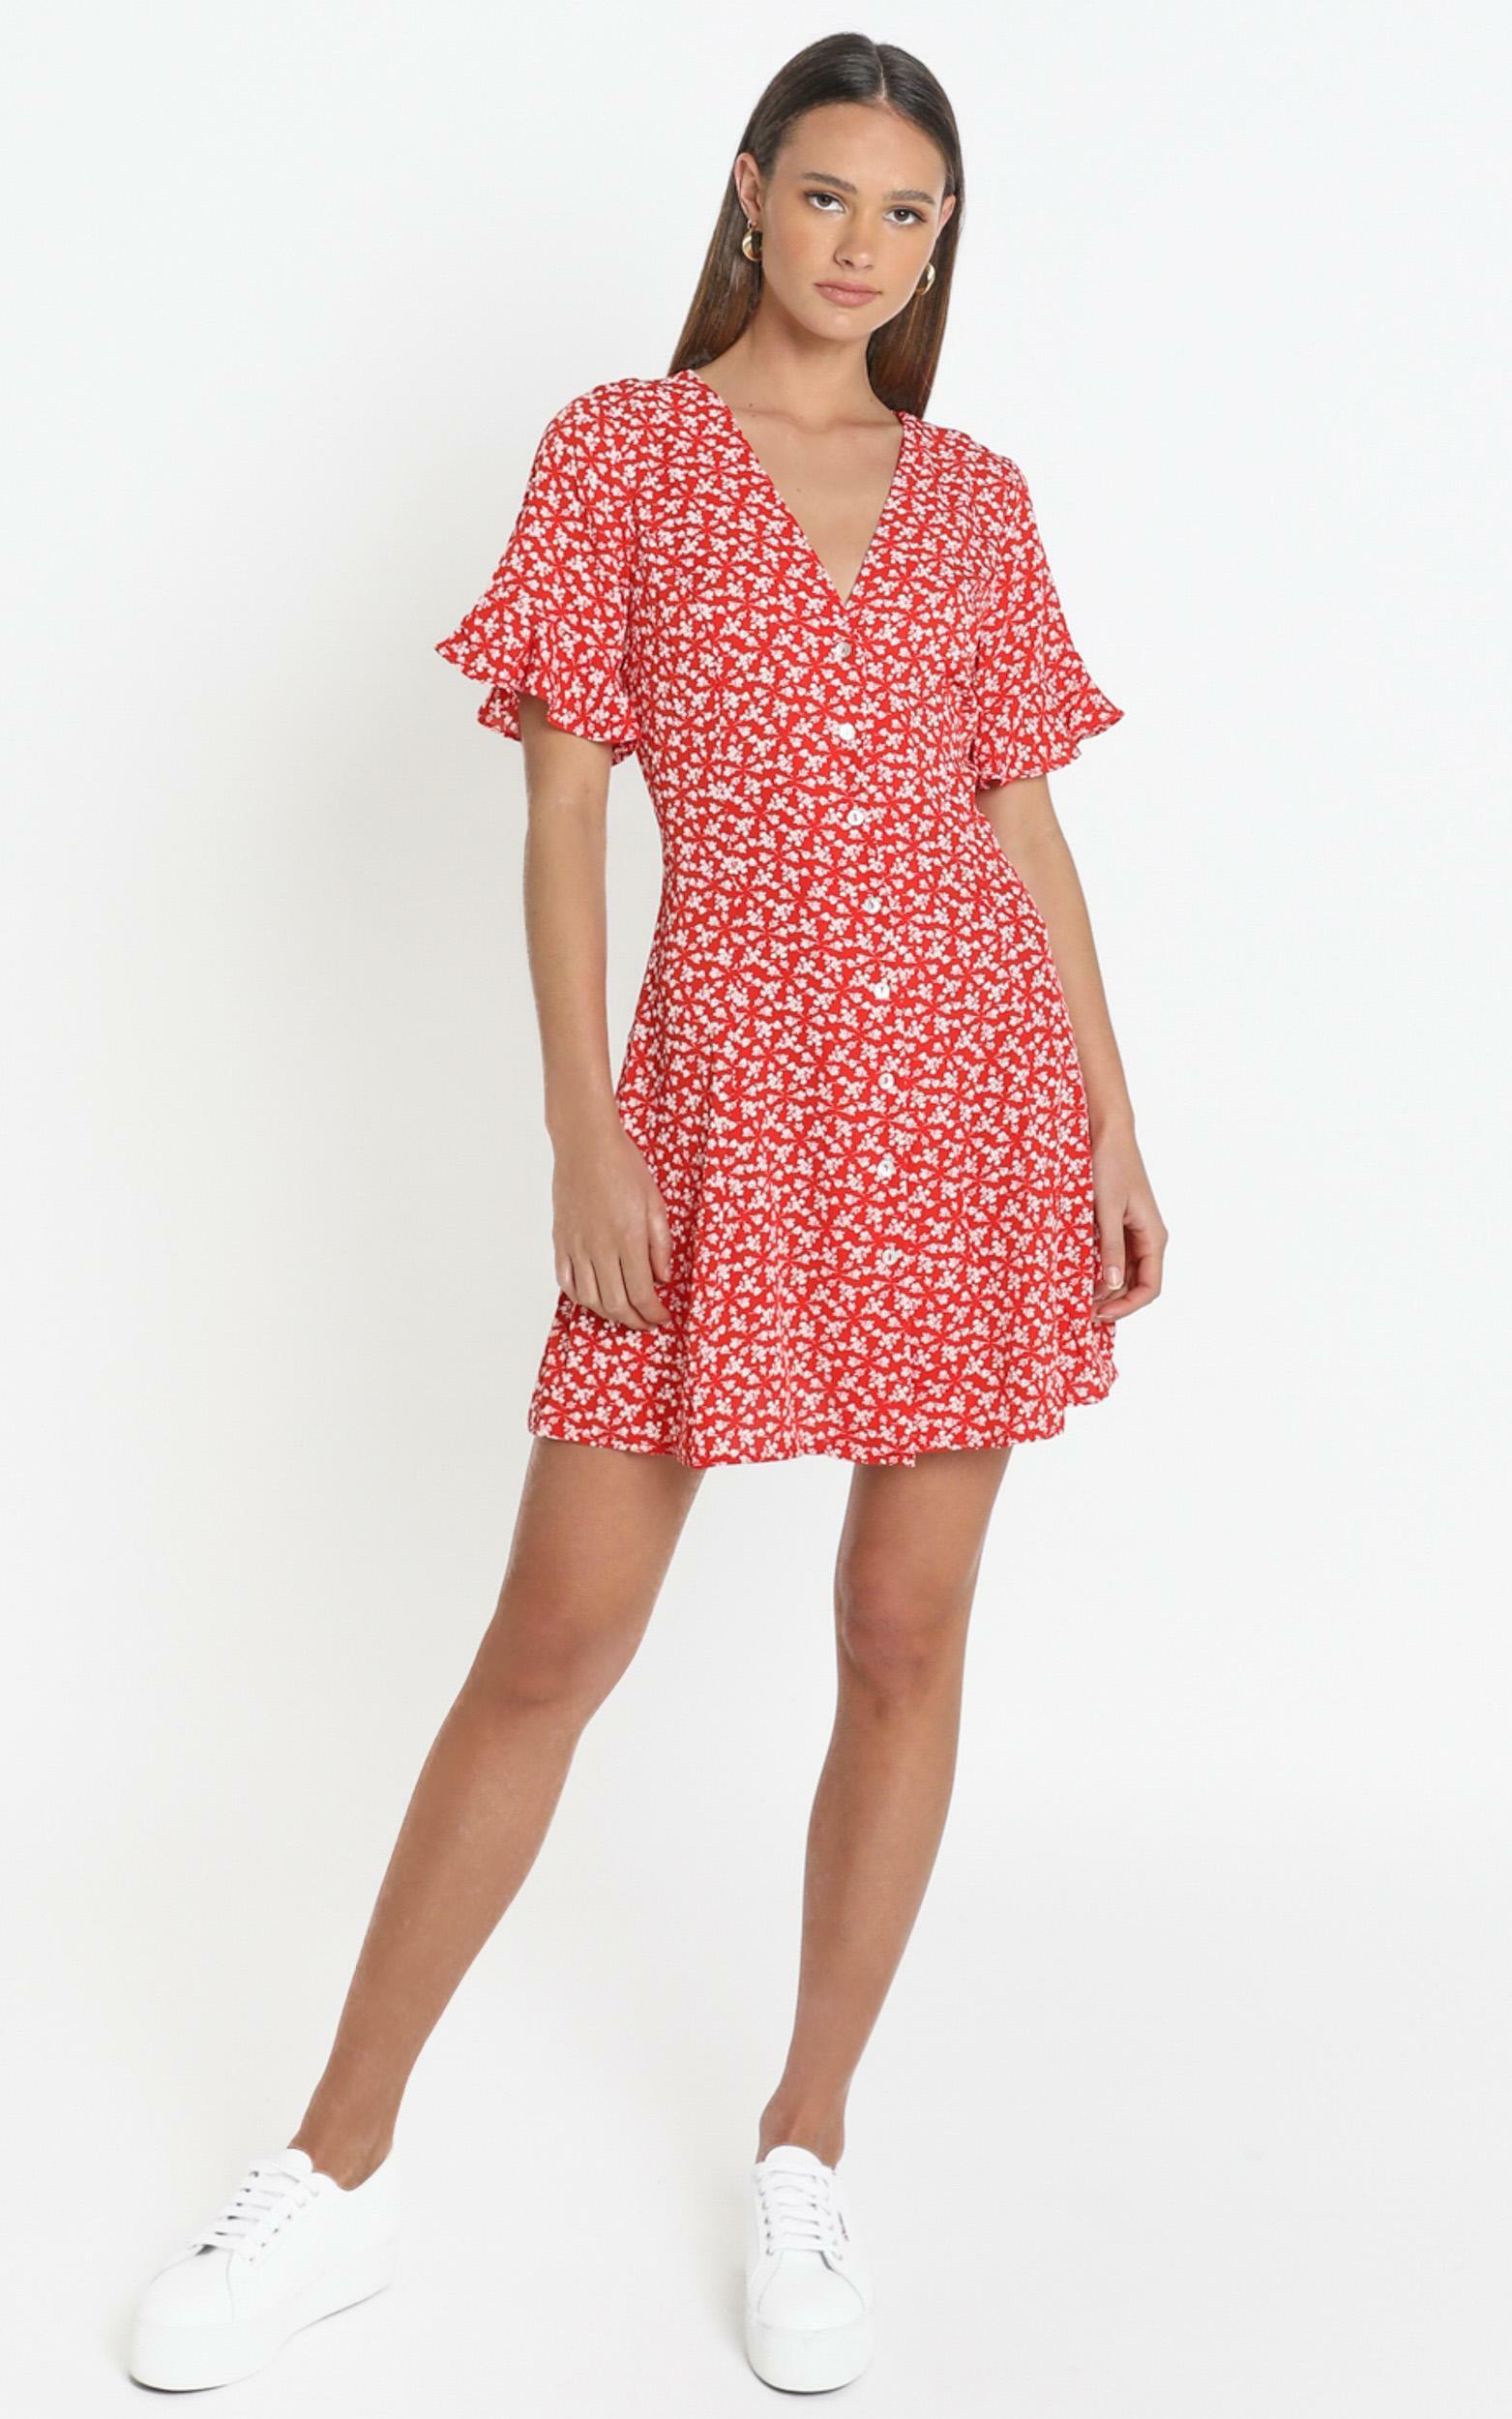 Tamara Dress in Red Floral - 12 (L), Red, hi-res image number null